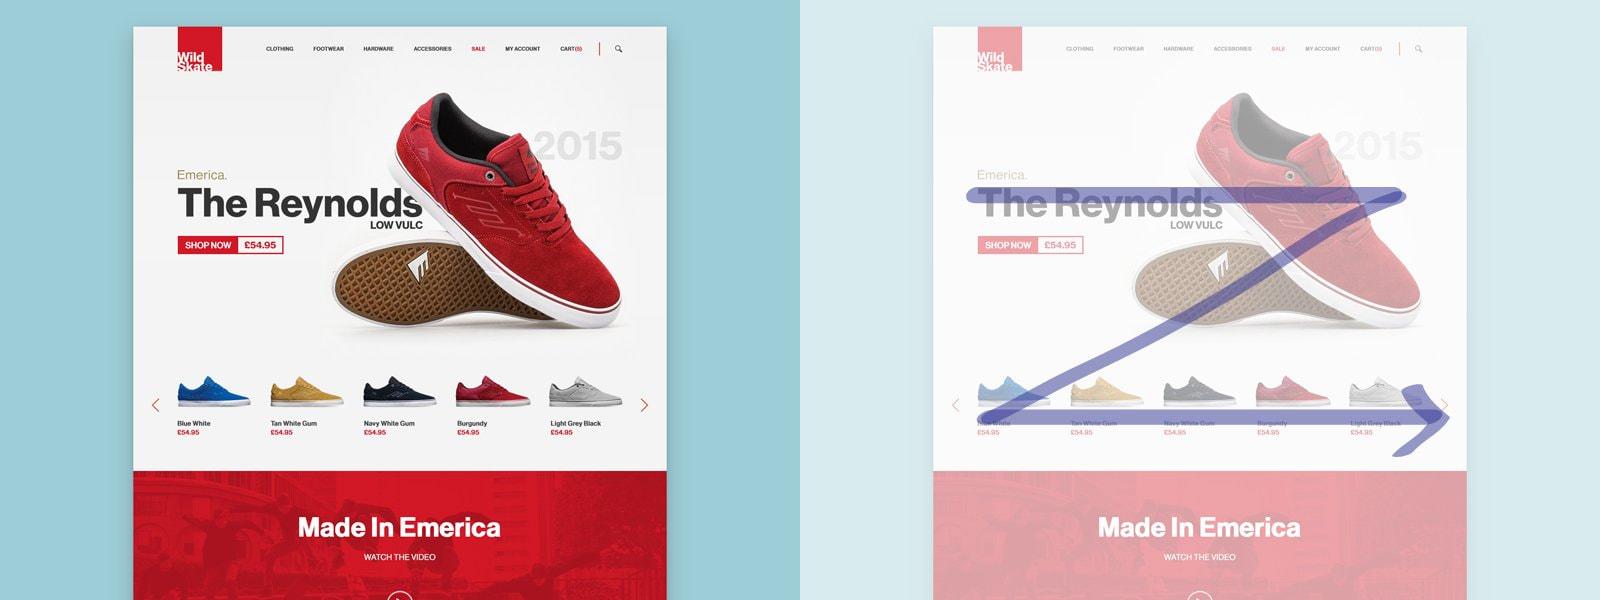 design-principles-18